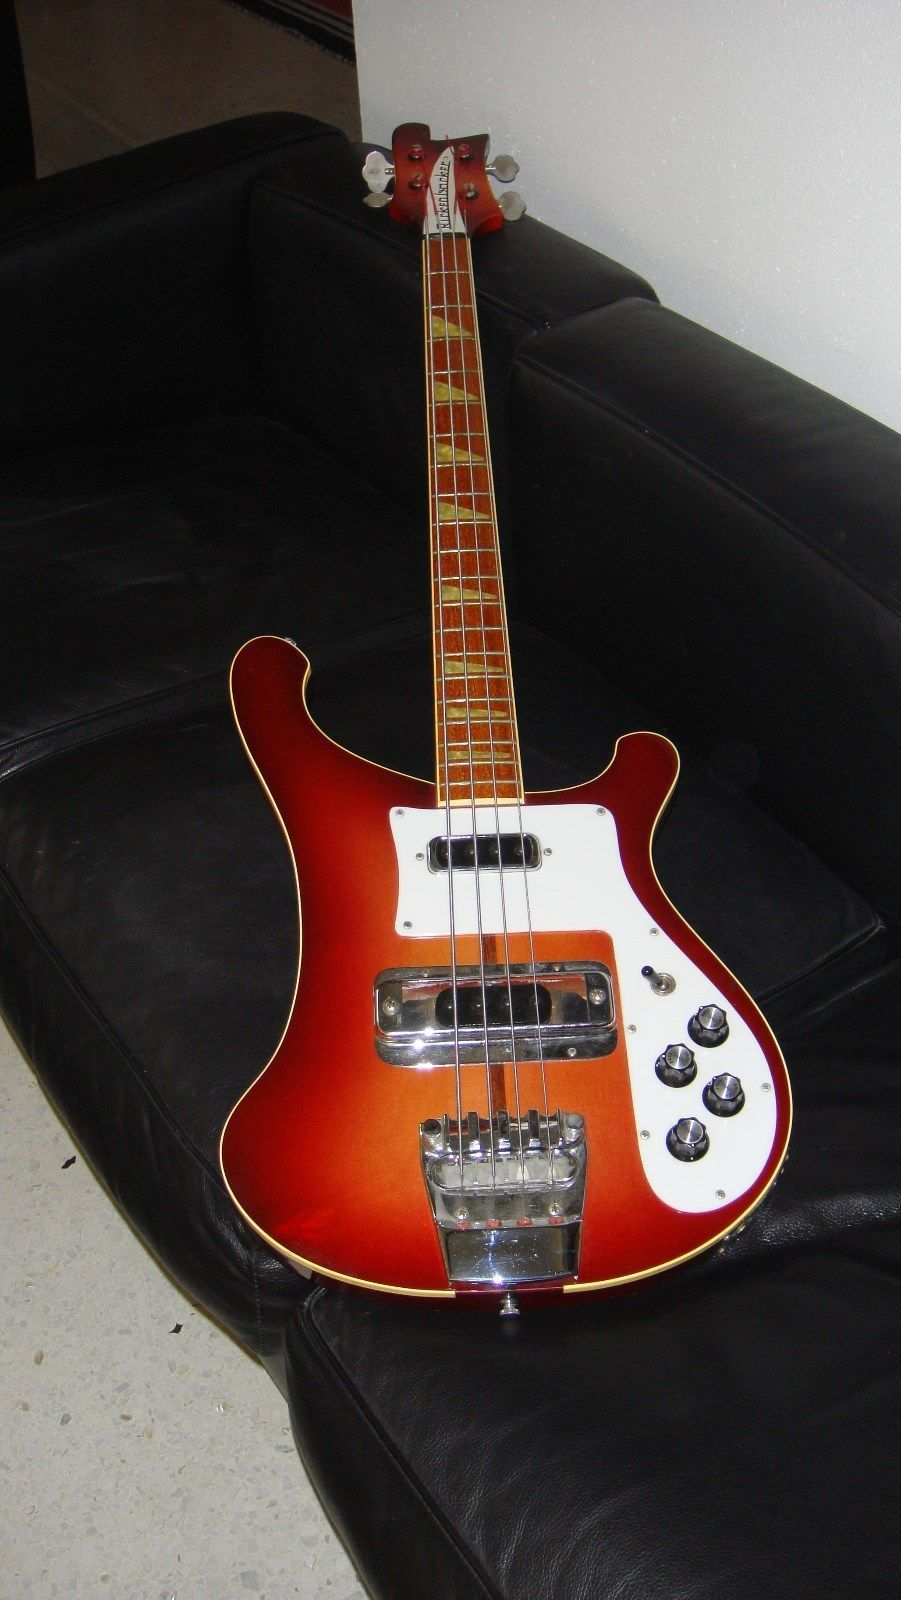 vintage 1976 rickenbacker model 4001 fireglo bass electric guitar rickenbacker 4001 guitar. Black Bedroom Furniture Sets. Home Design Ideas